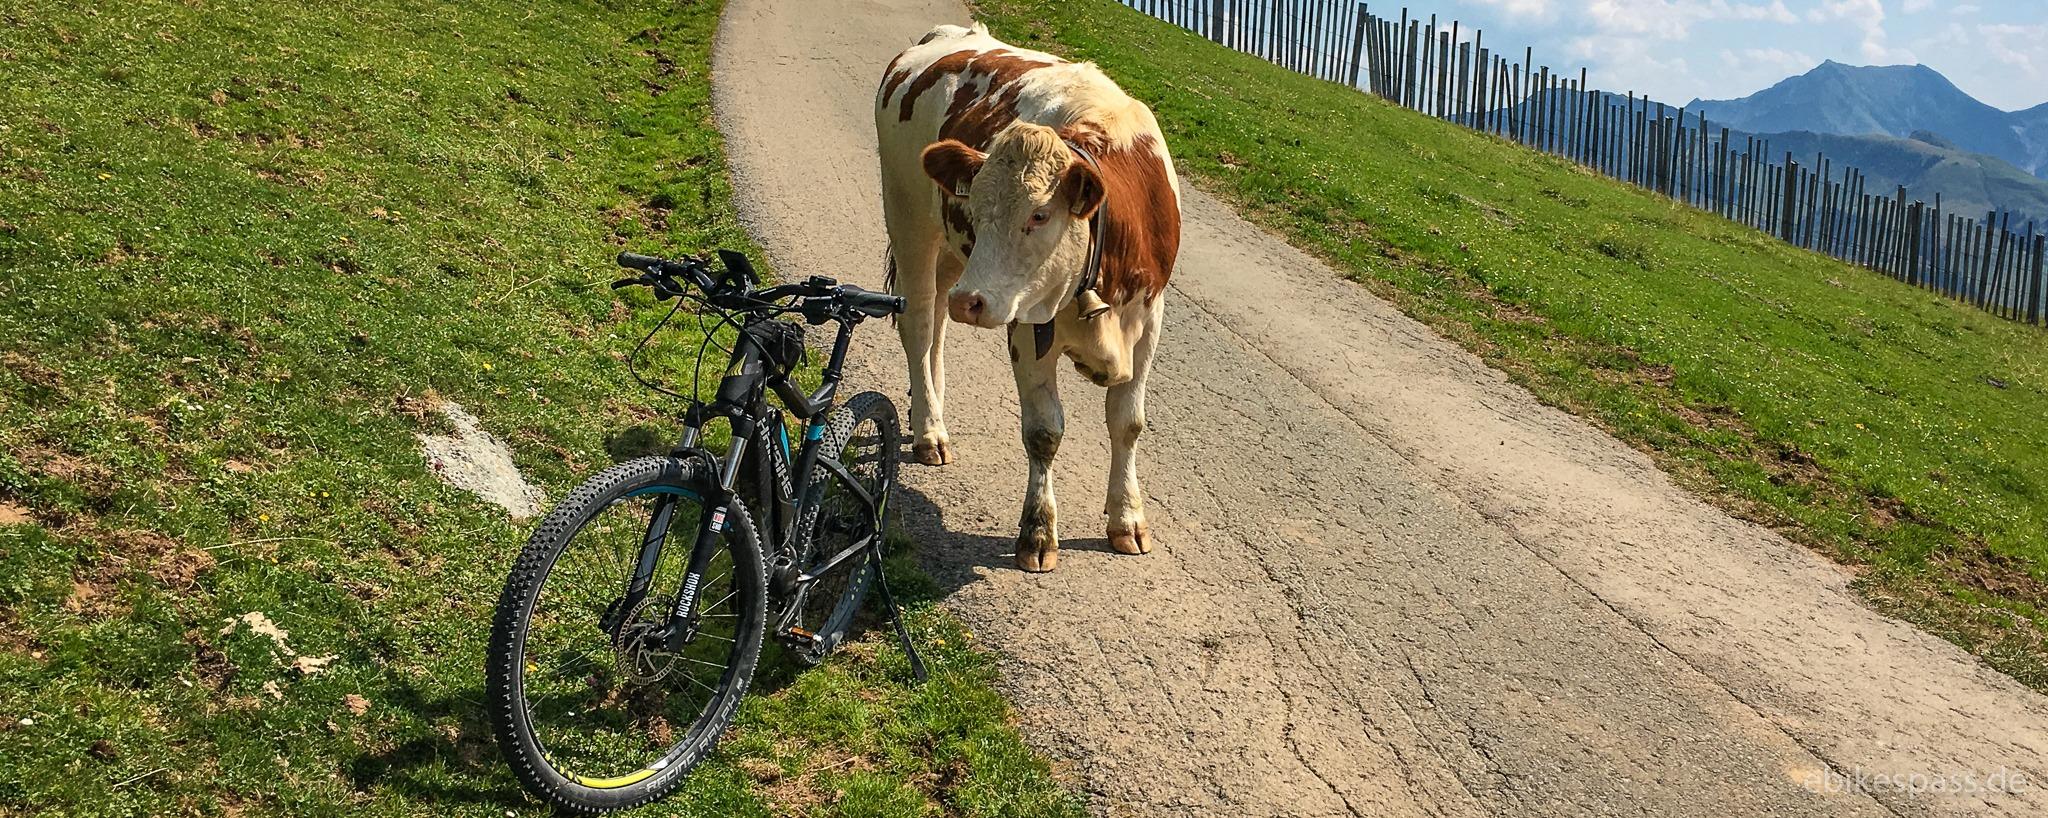 E-Bike und Kuh